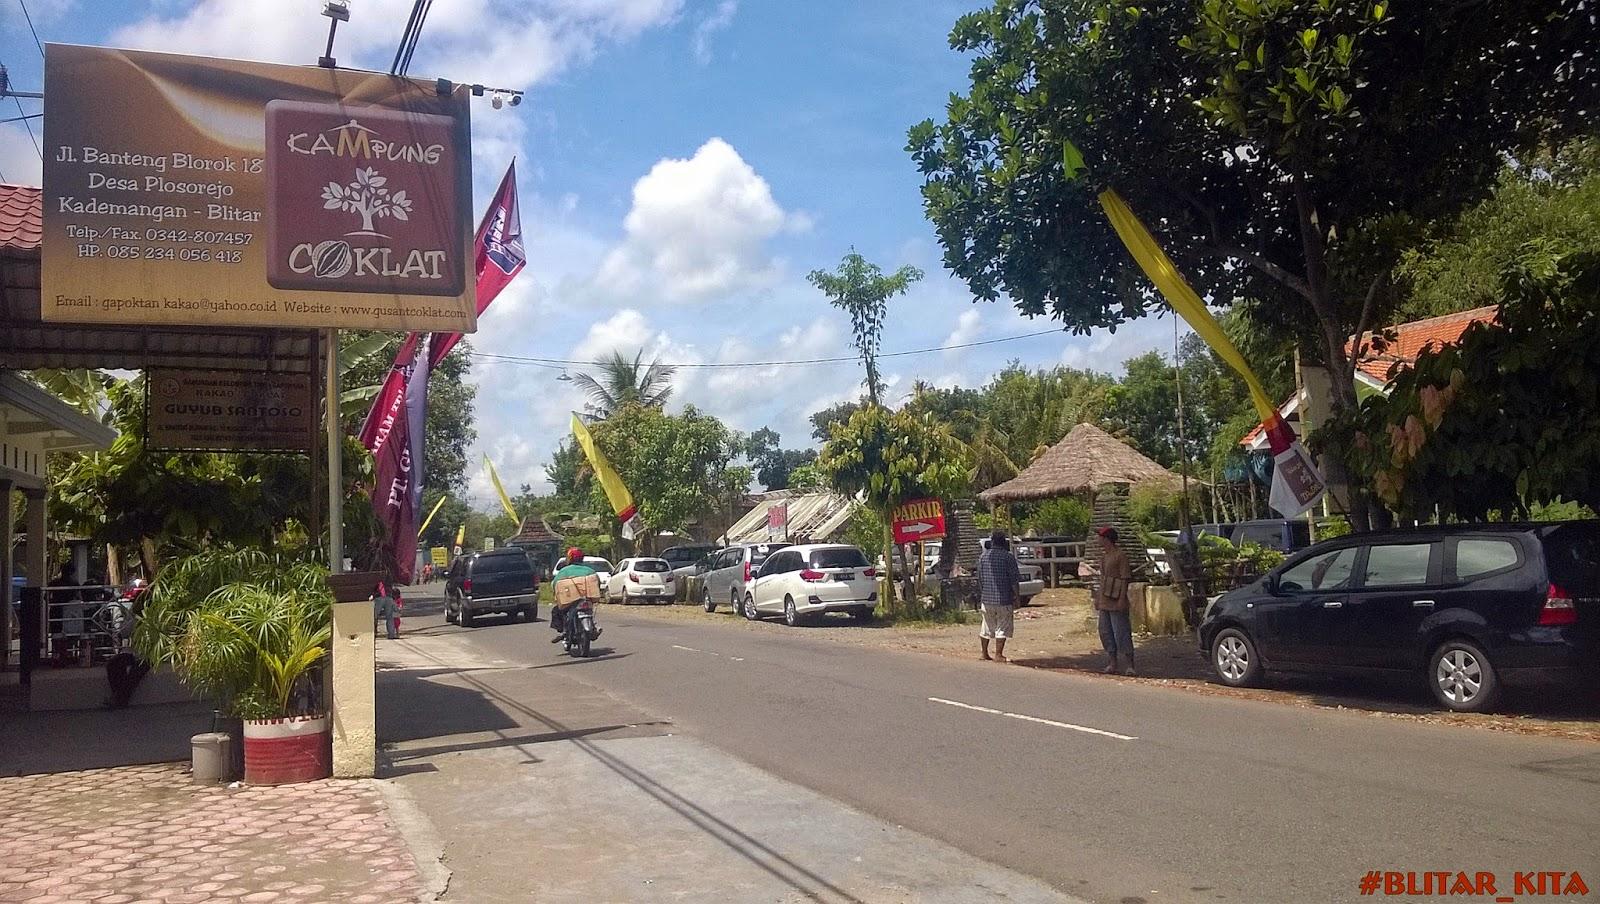 Berwisata Sambil Belajar Kampung Coklat Blitar Kemapata Online Berlokasi Jalan